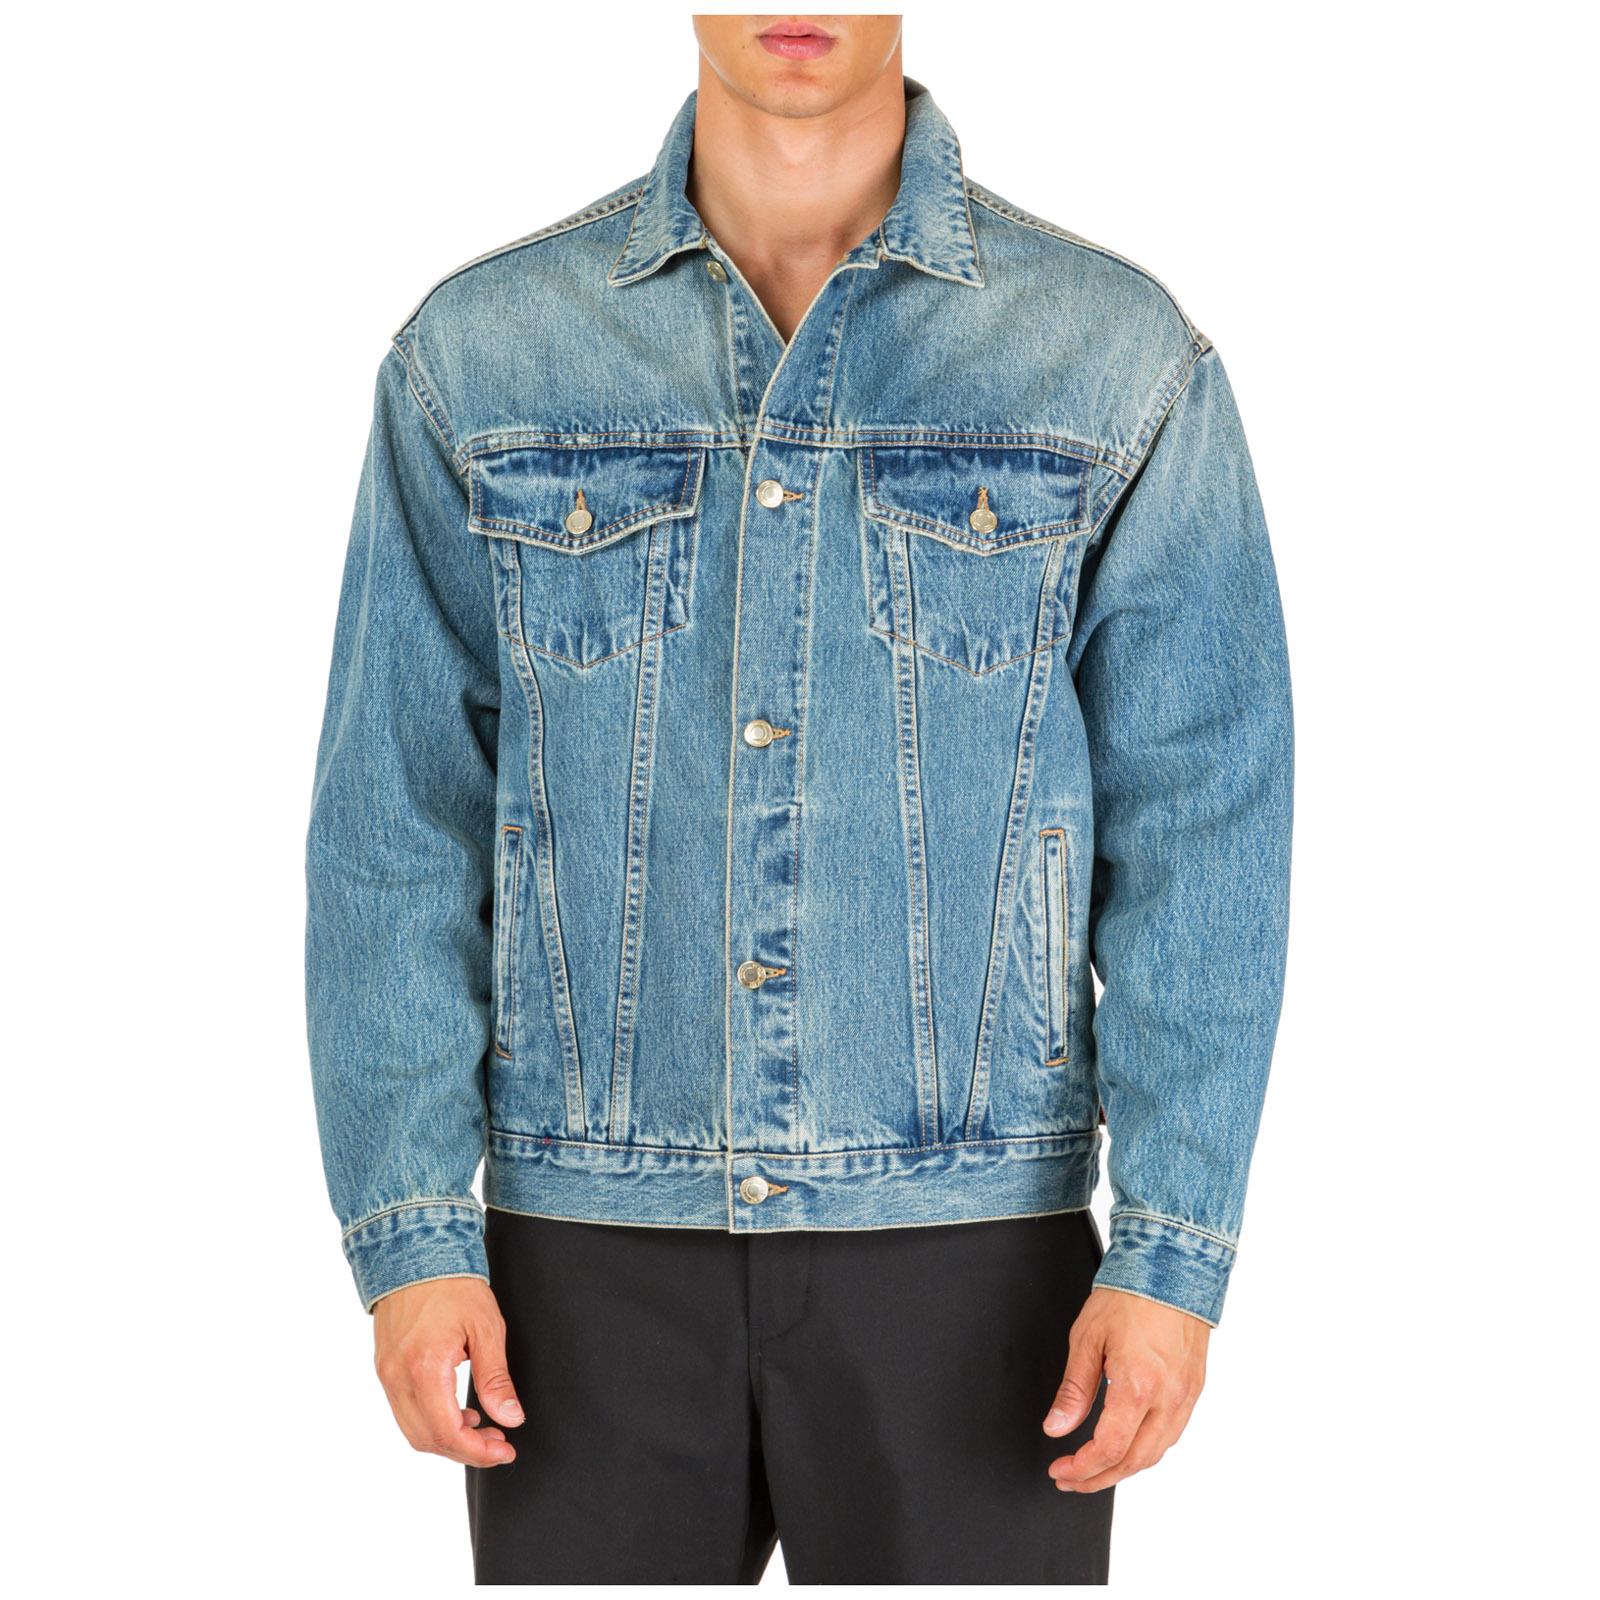 Men's denim outerwear jacket blouson jesus